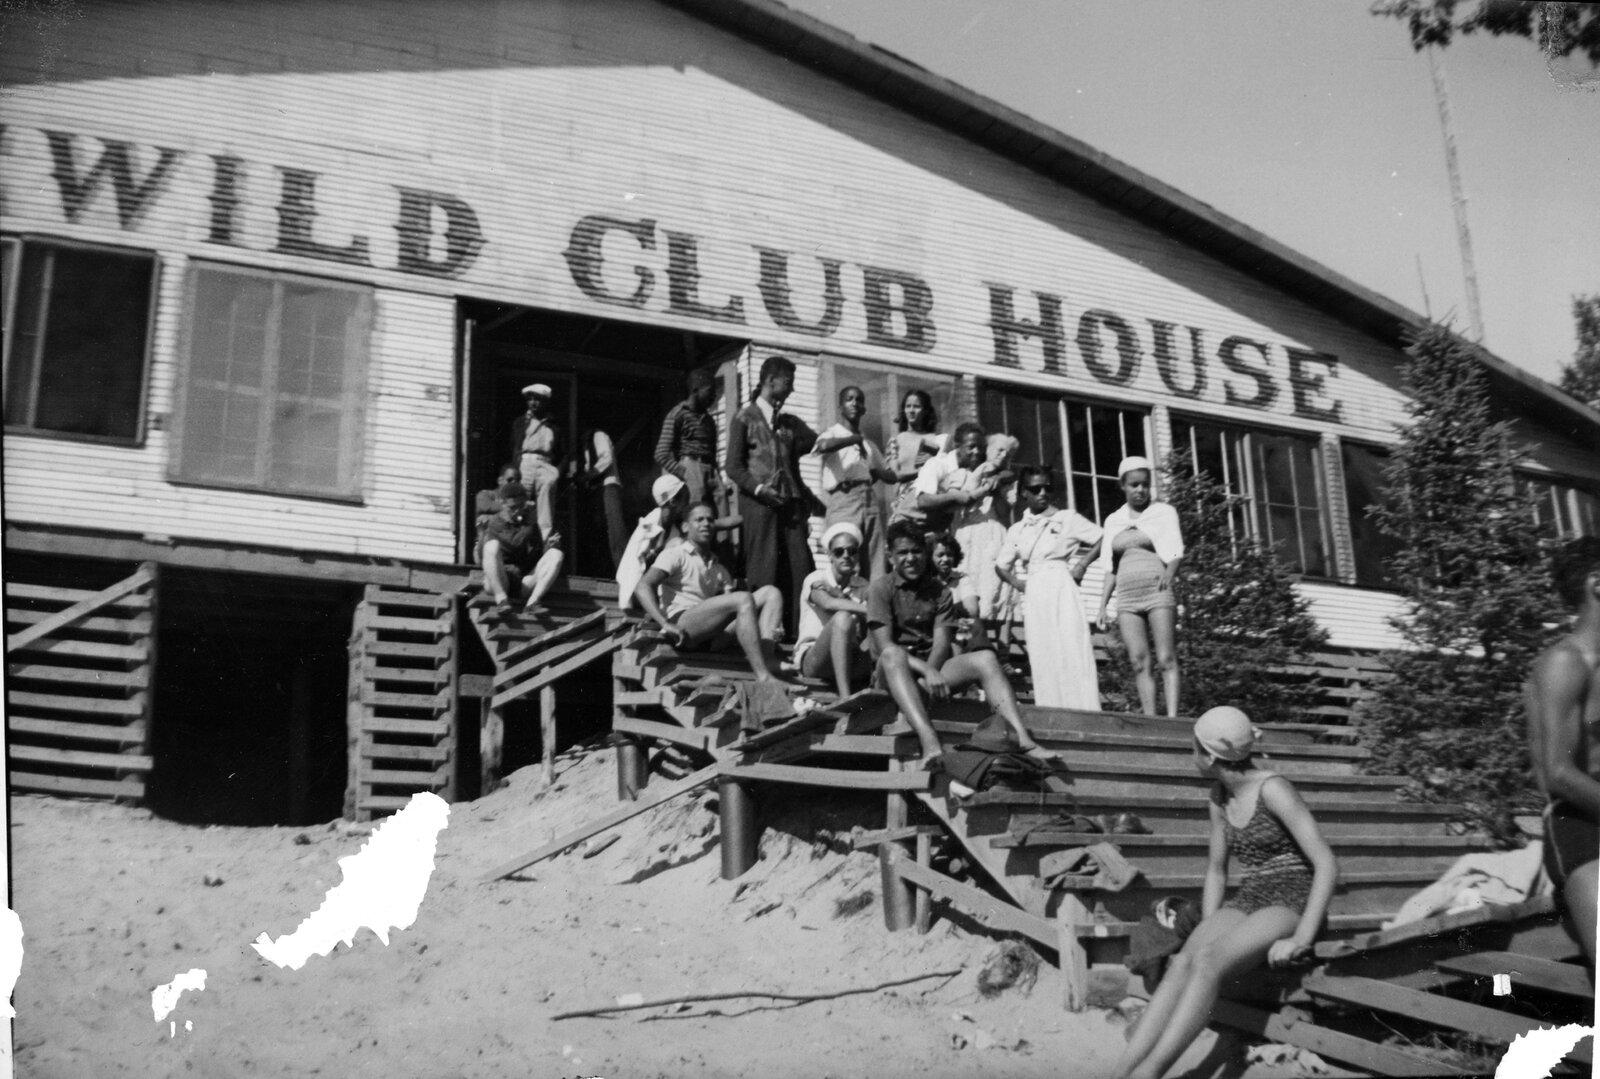 1927 : Idlewild Summer Resort Company Formed